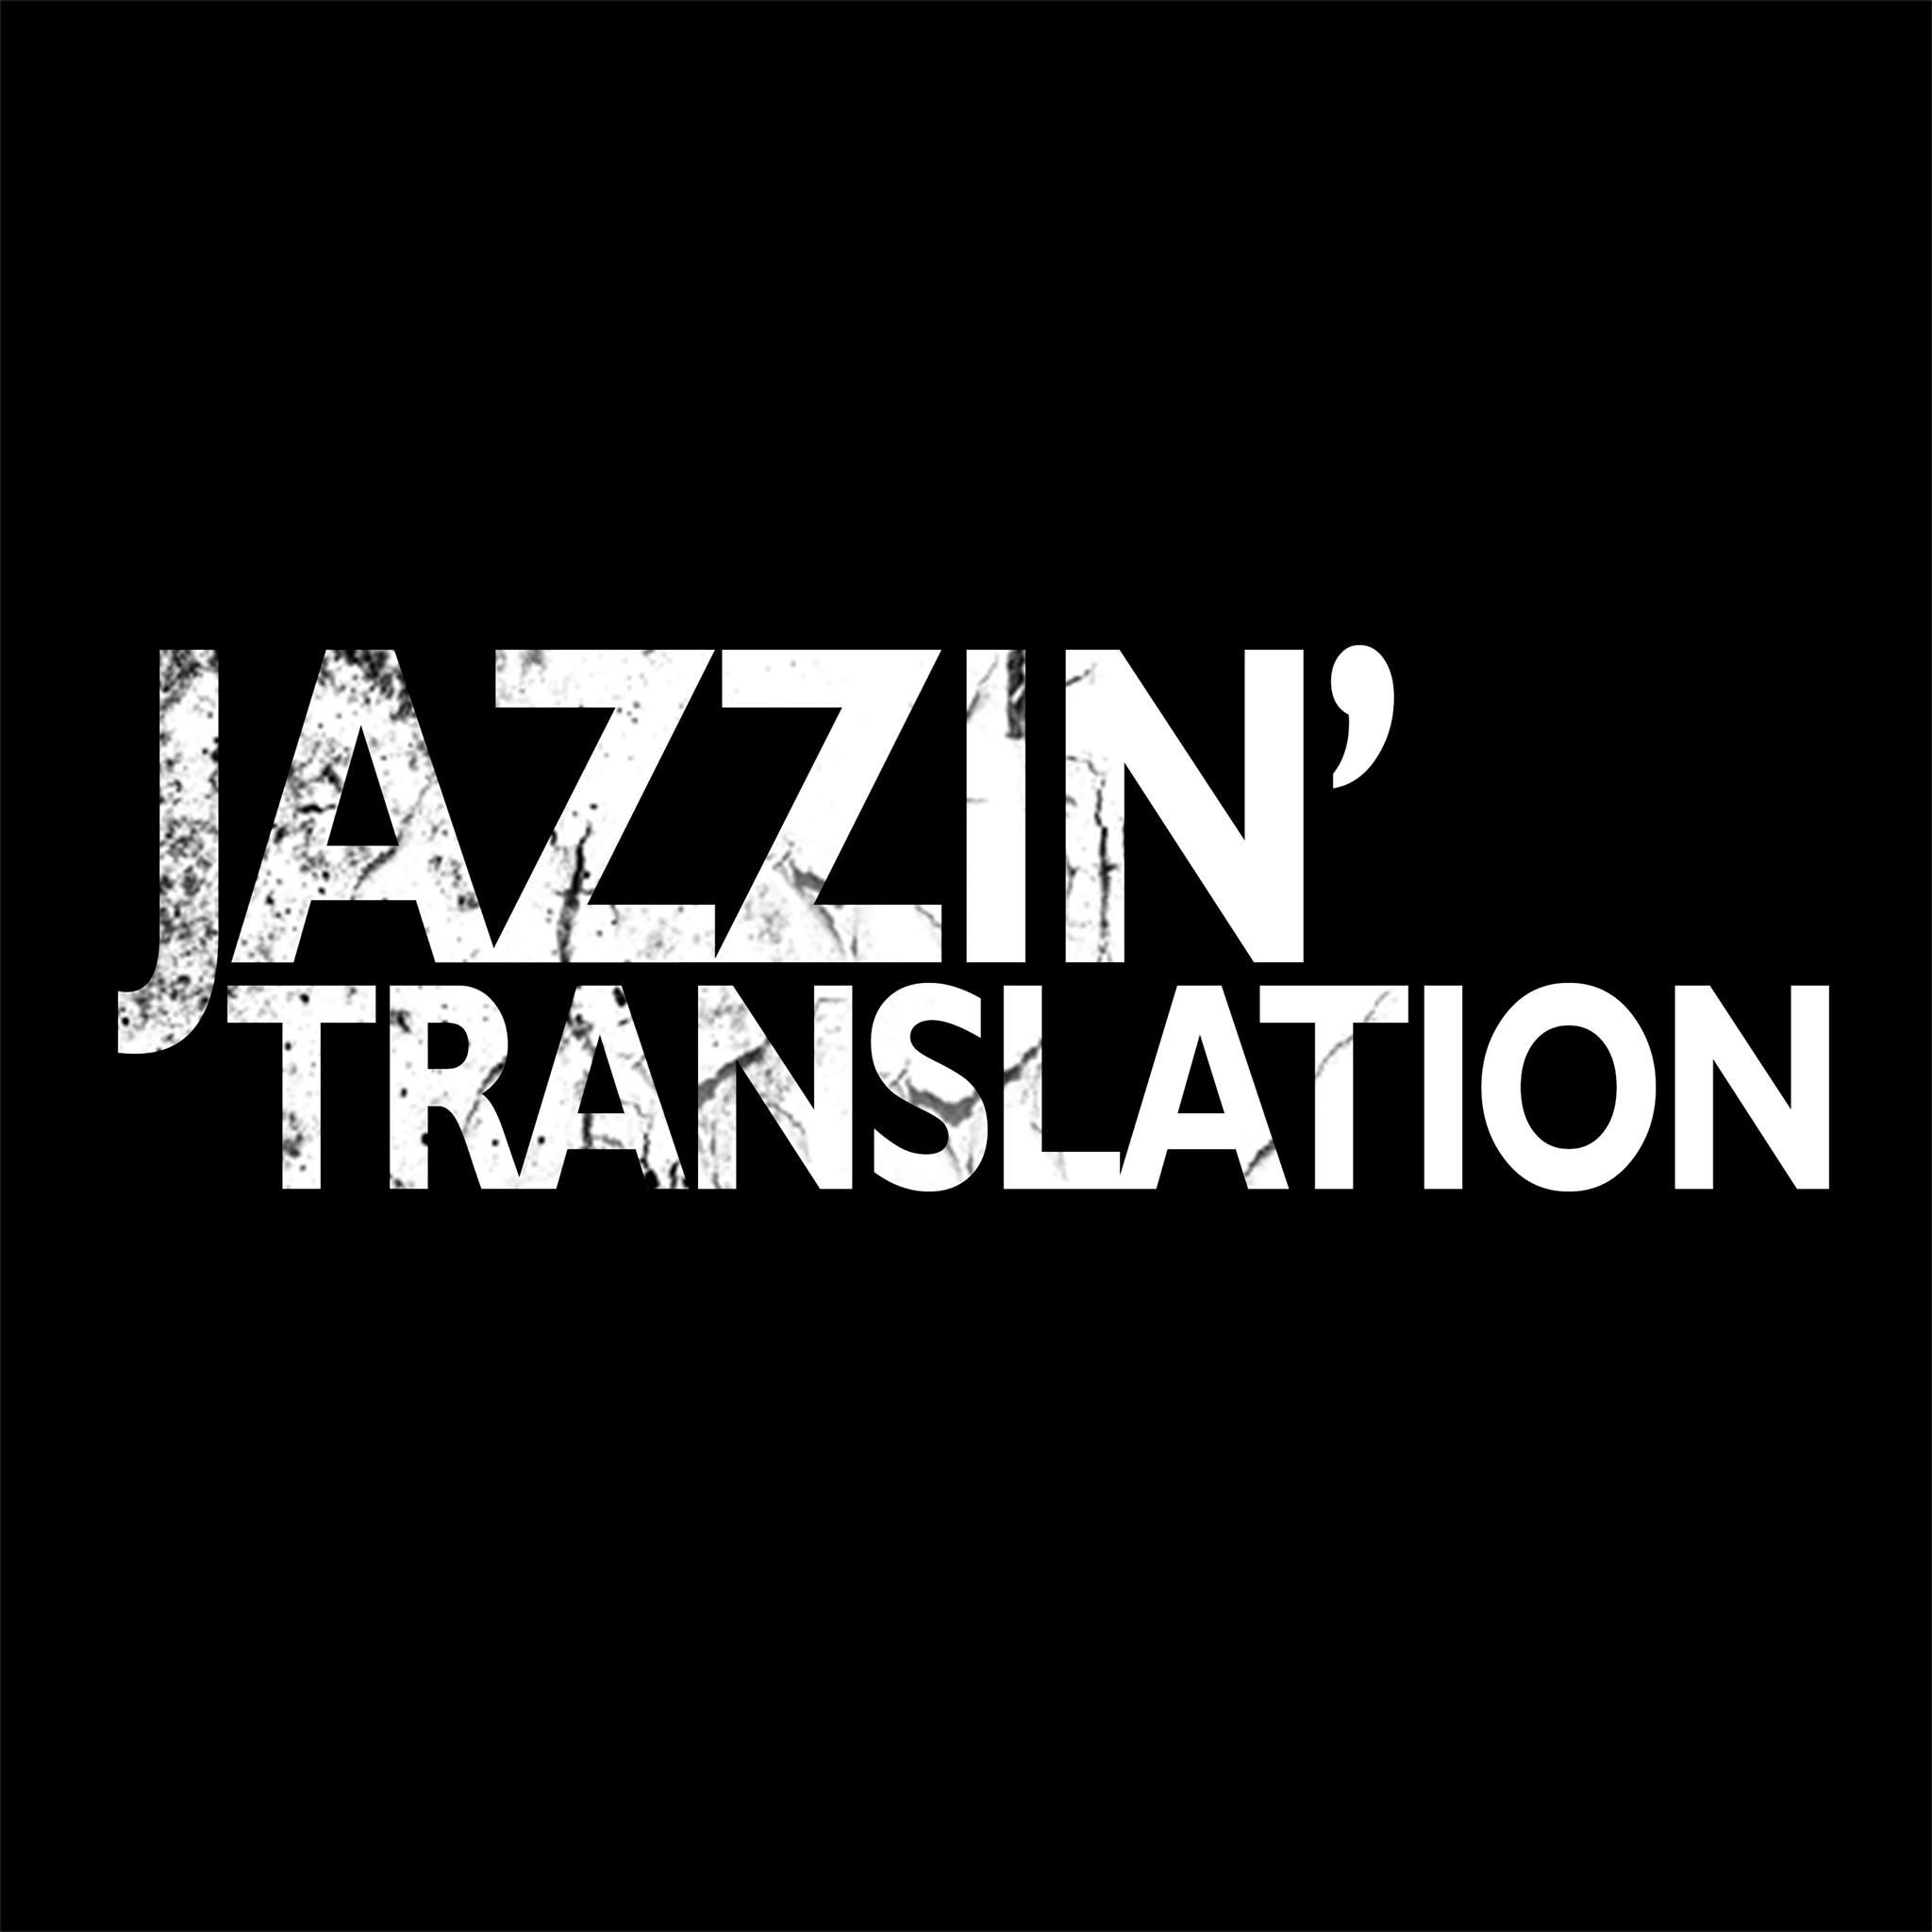 JAZZIN TRANSLATION